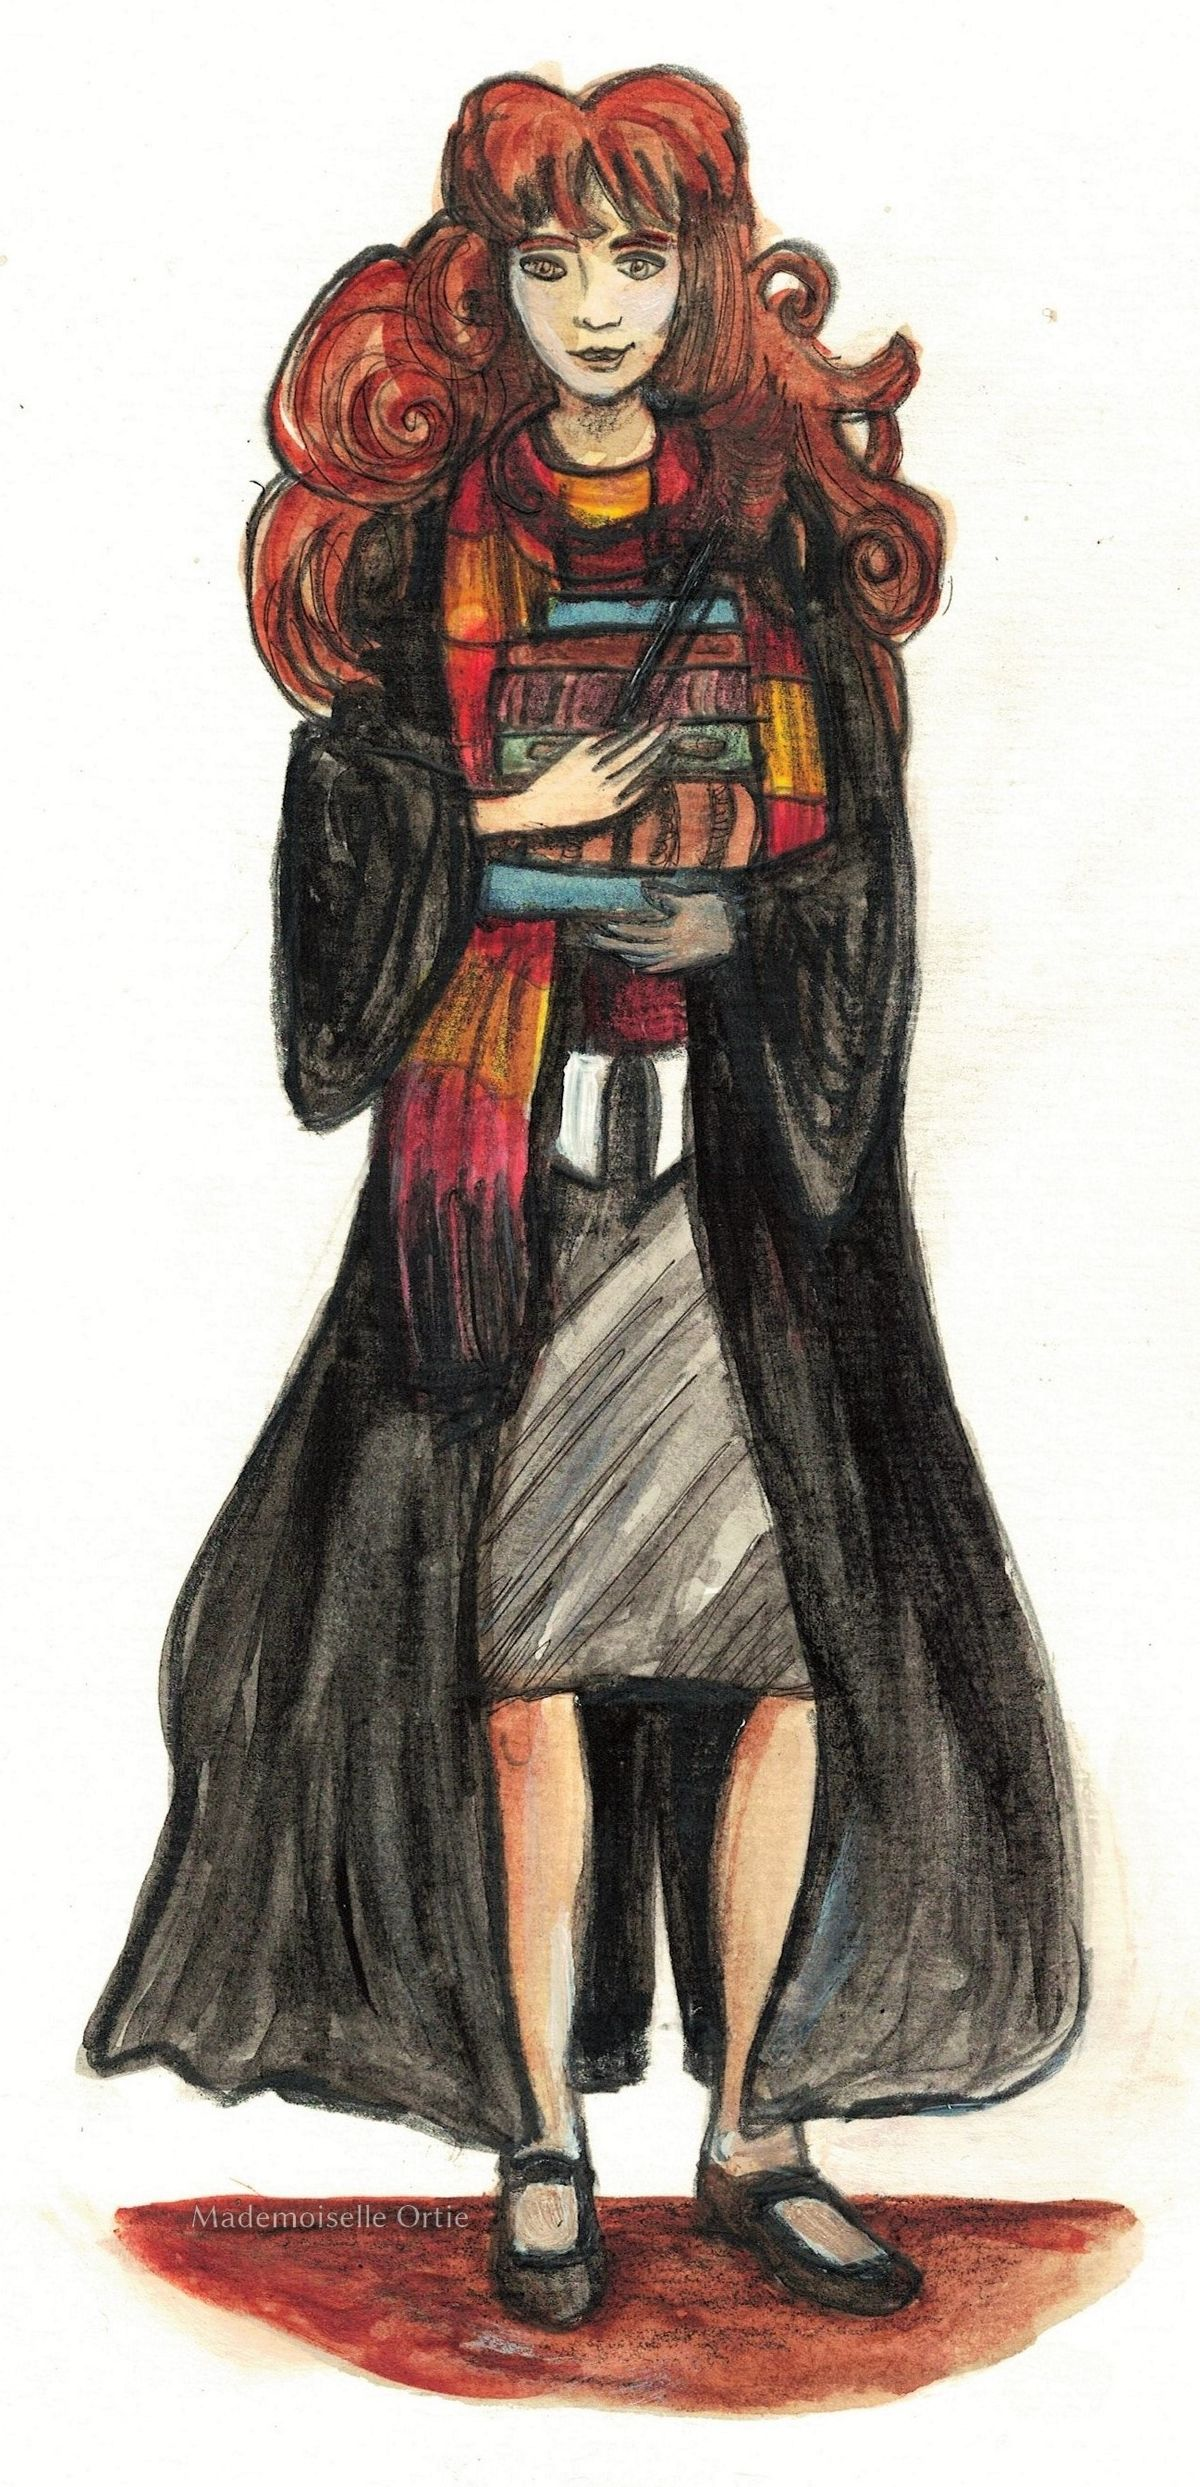 Hermione granger wikip dia - Qui est hermione granger ...